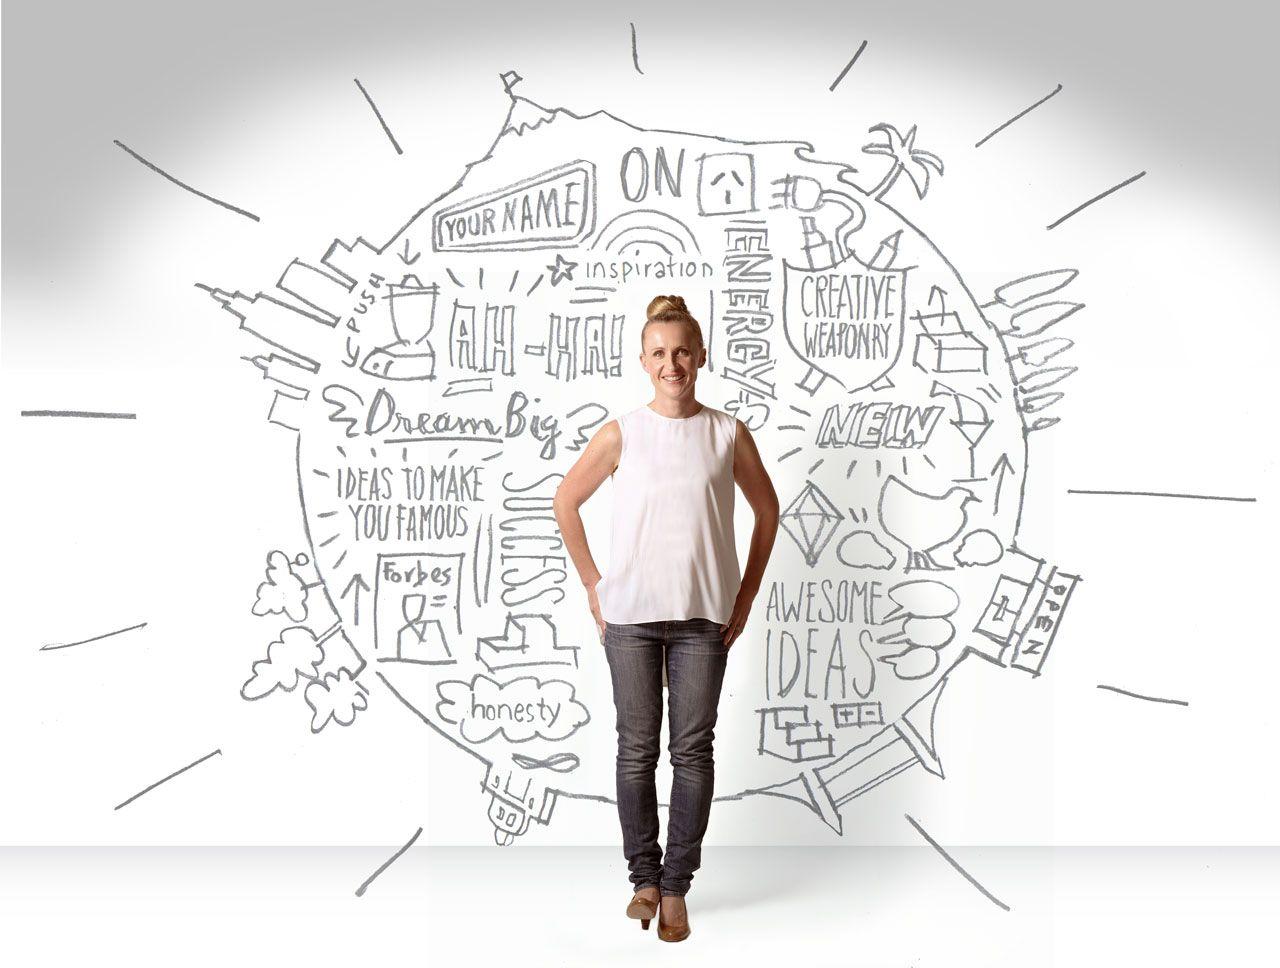 The Idea Generator Mandy Scammell Http Www Theideagenerator Com Au Name Inspiration Dream Big Inspiration